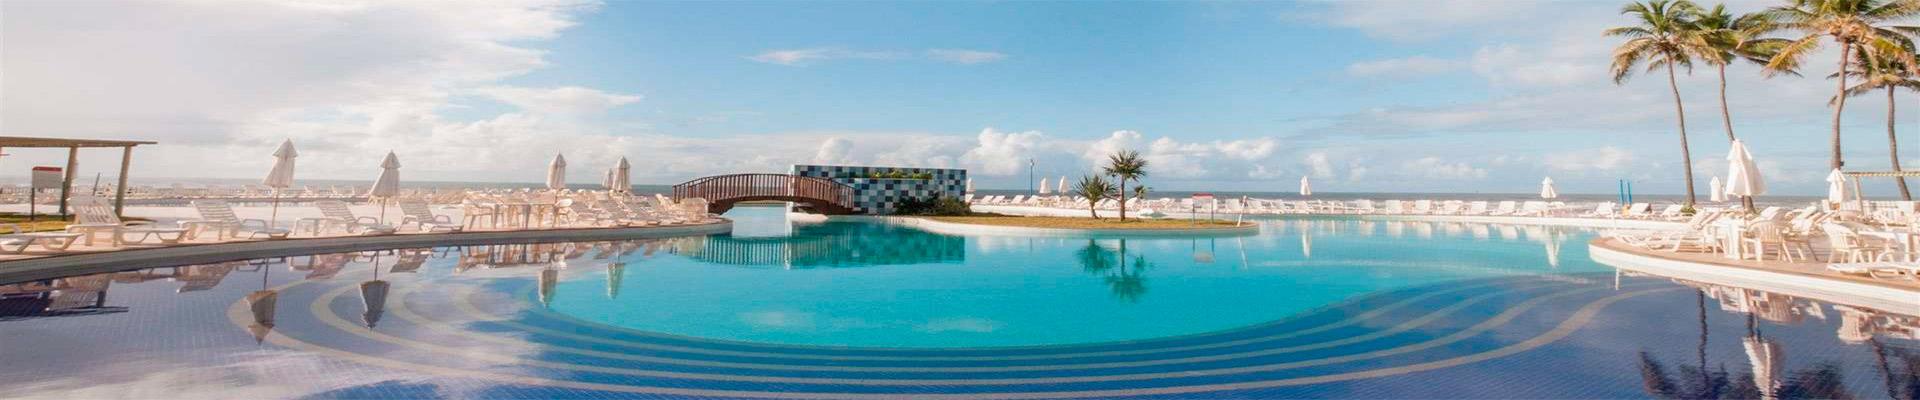 Resorts Aracaju – 03 noites